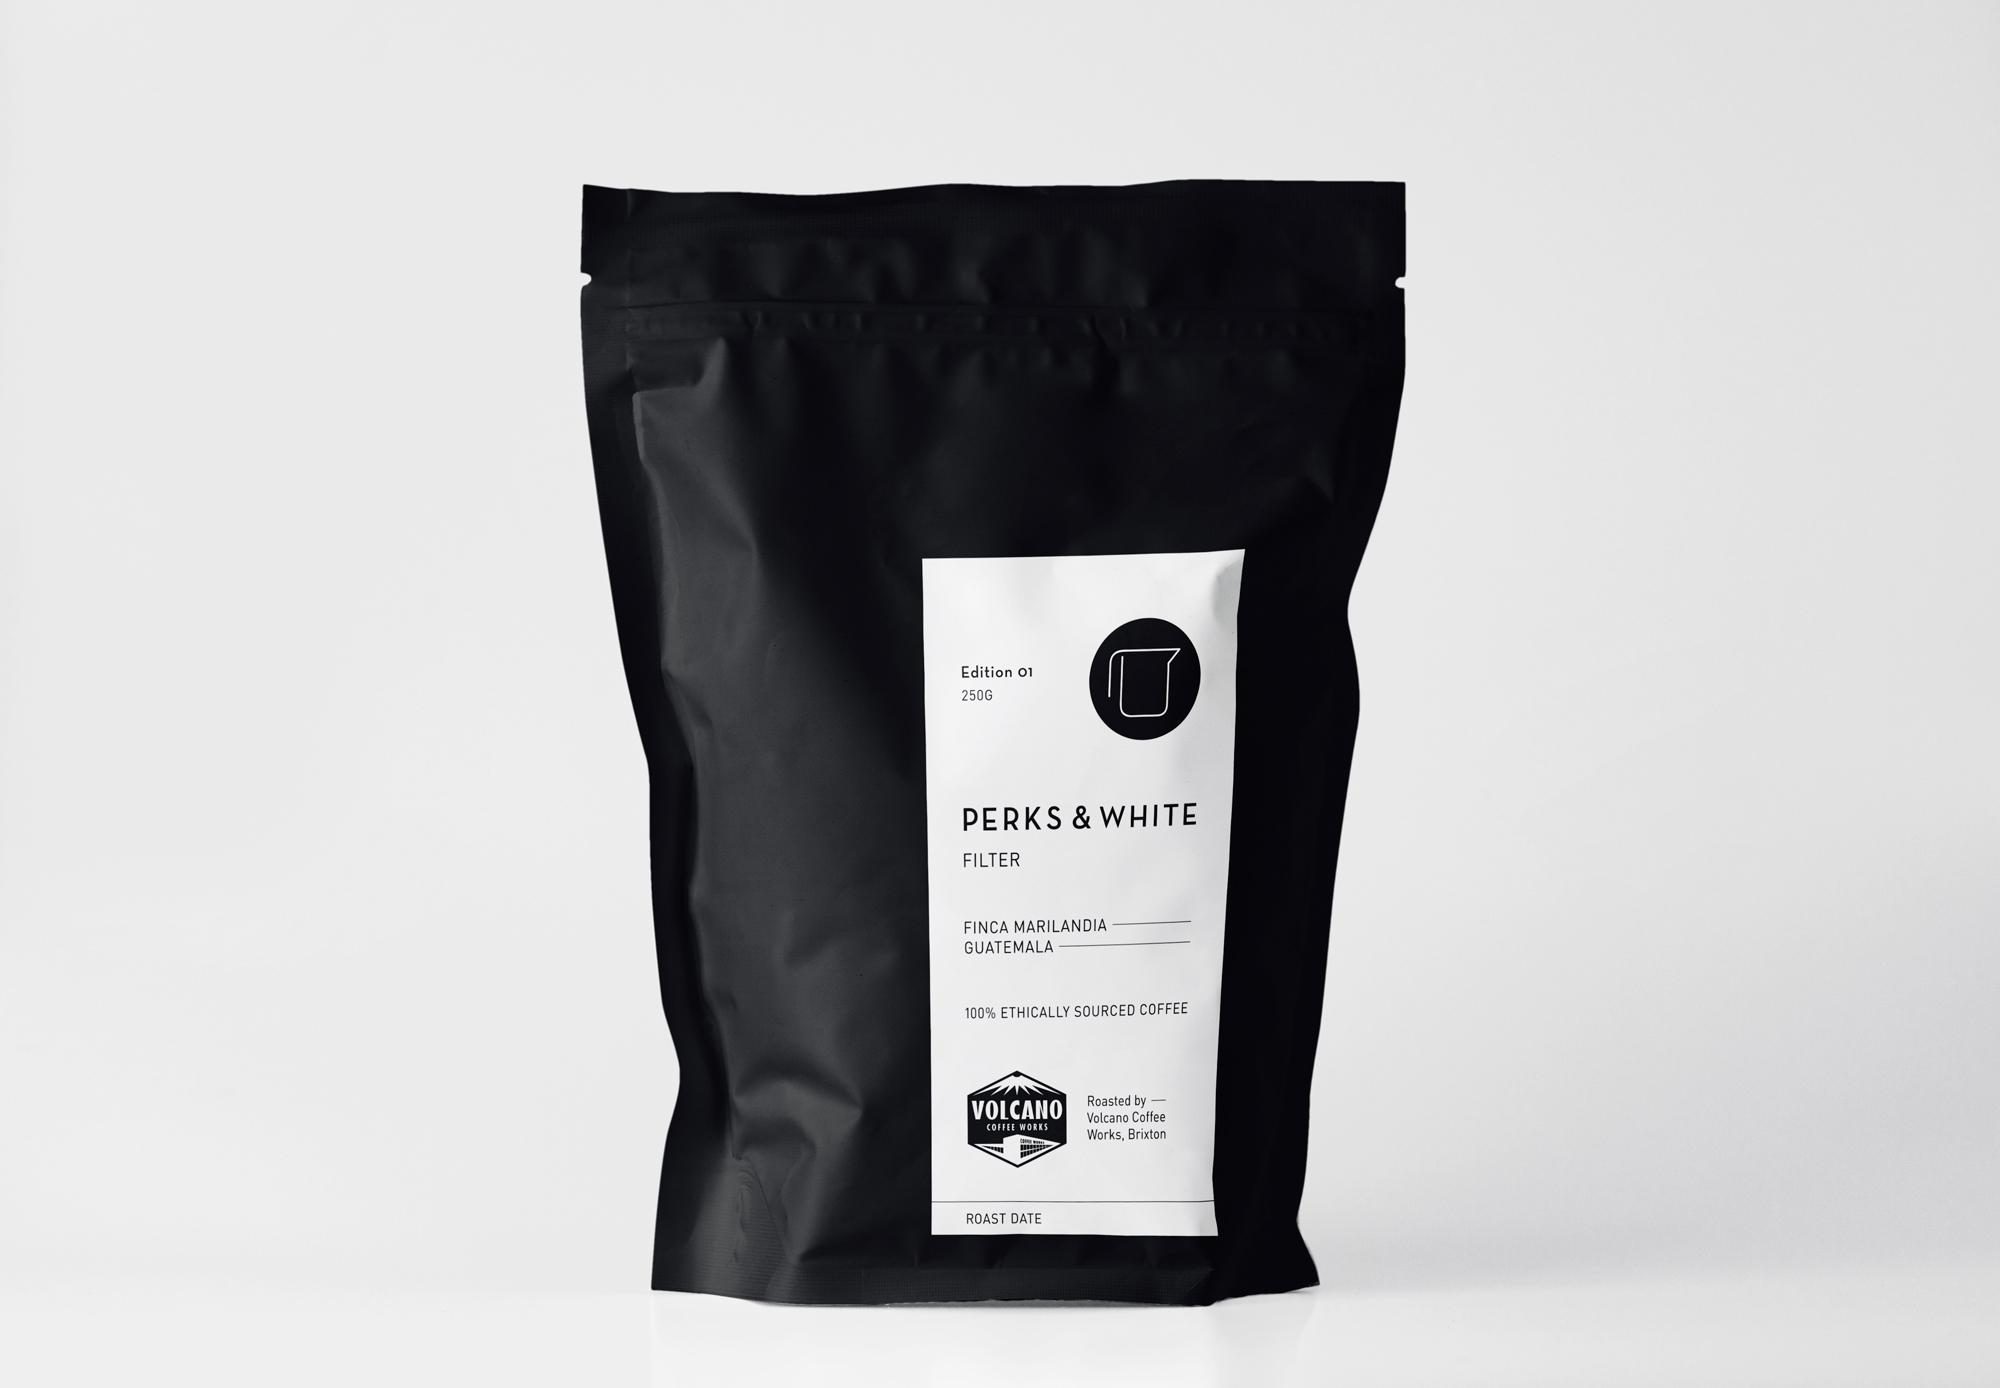 p&w_coffee-bag_mockup_02.jpg